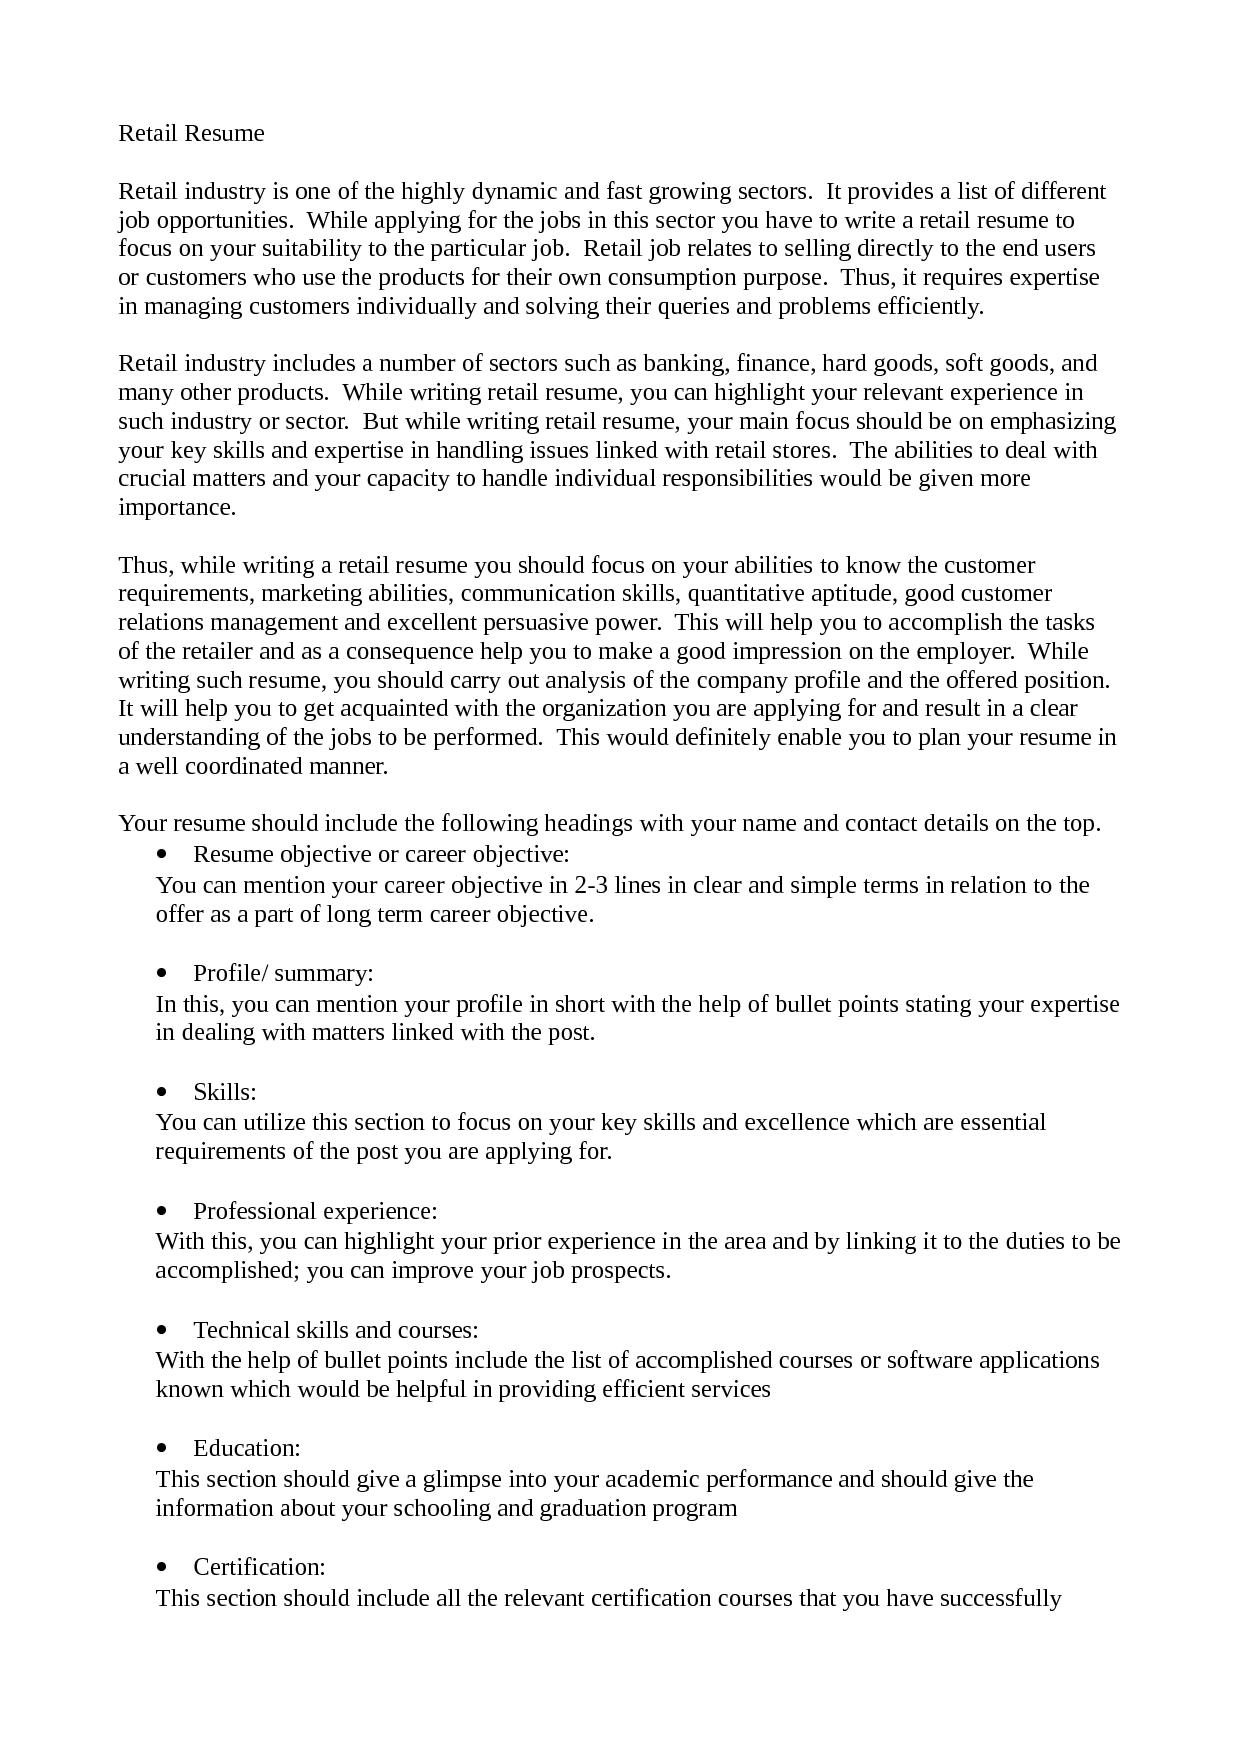 resume sample retail industry Job resume samples